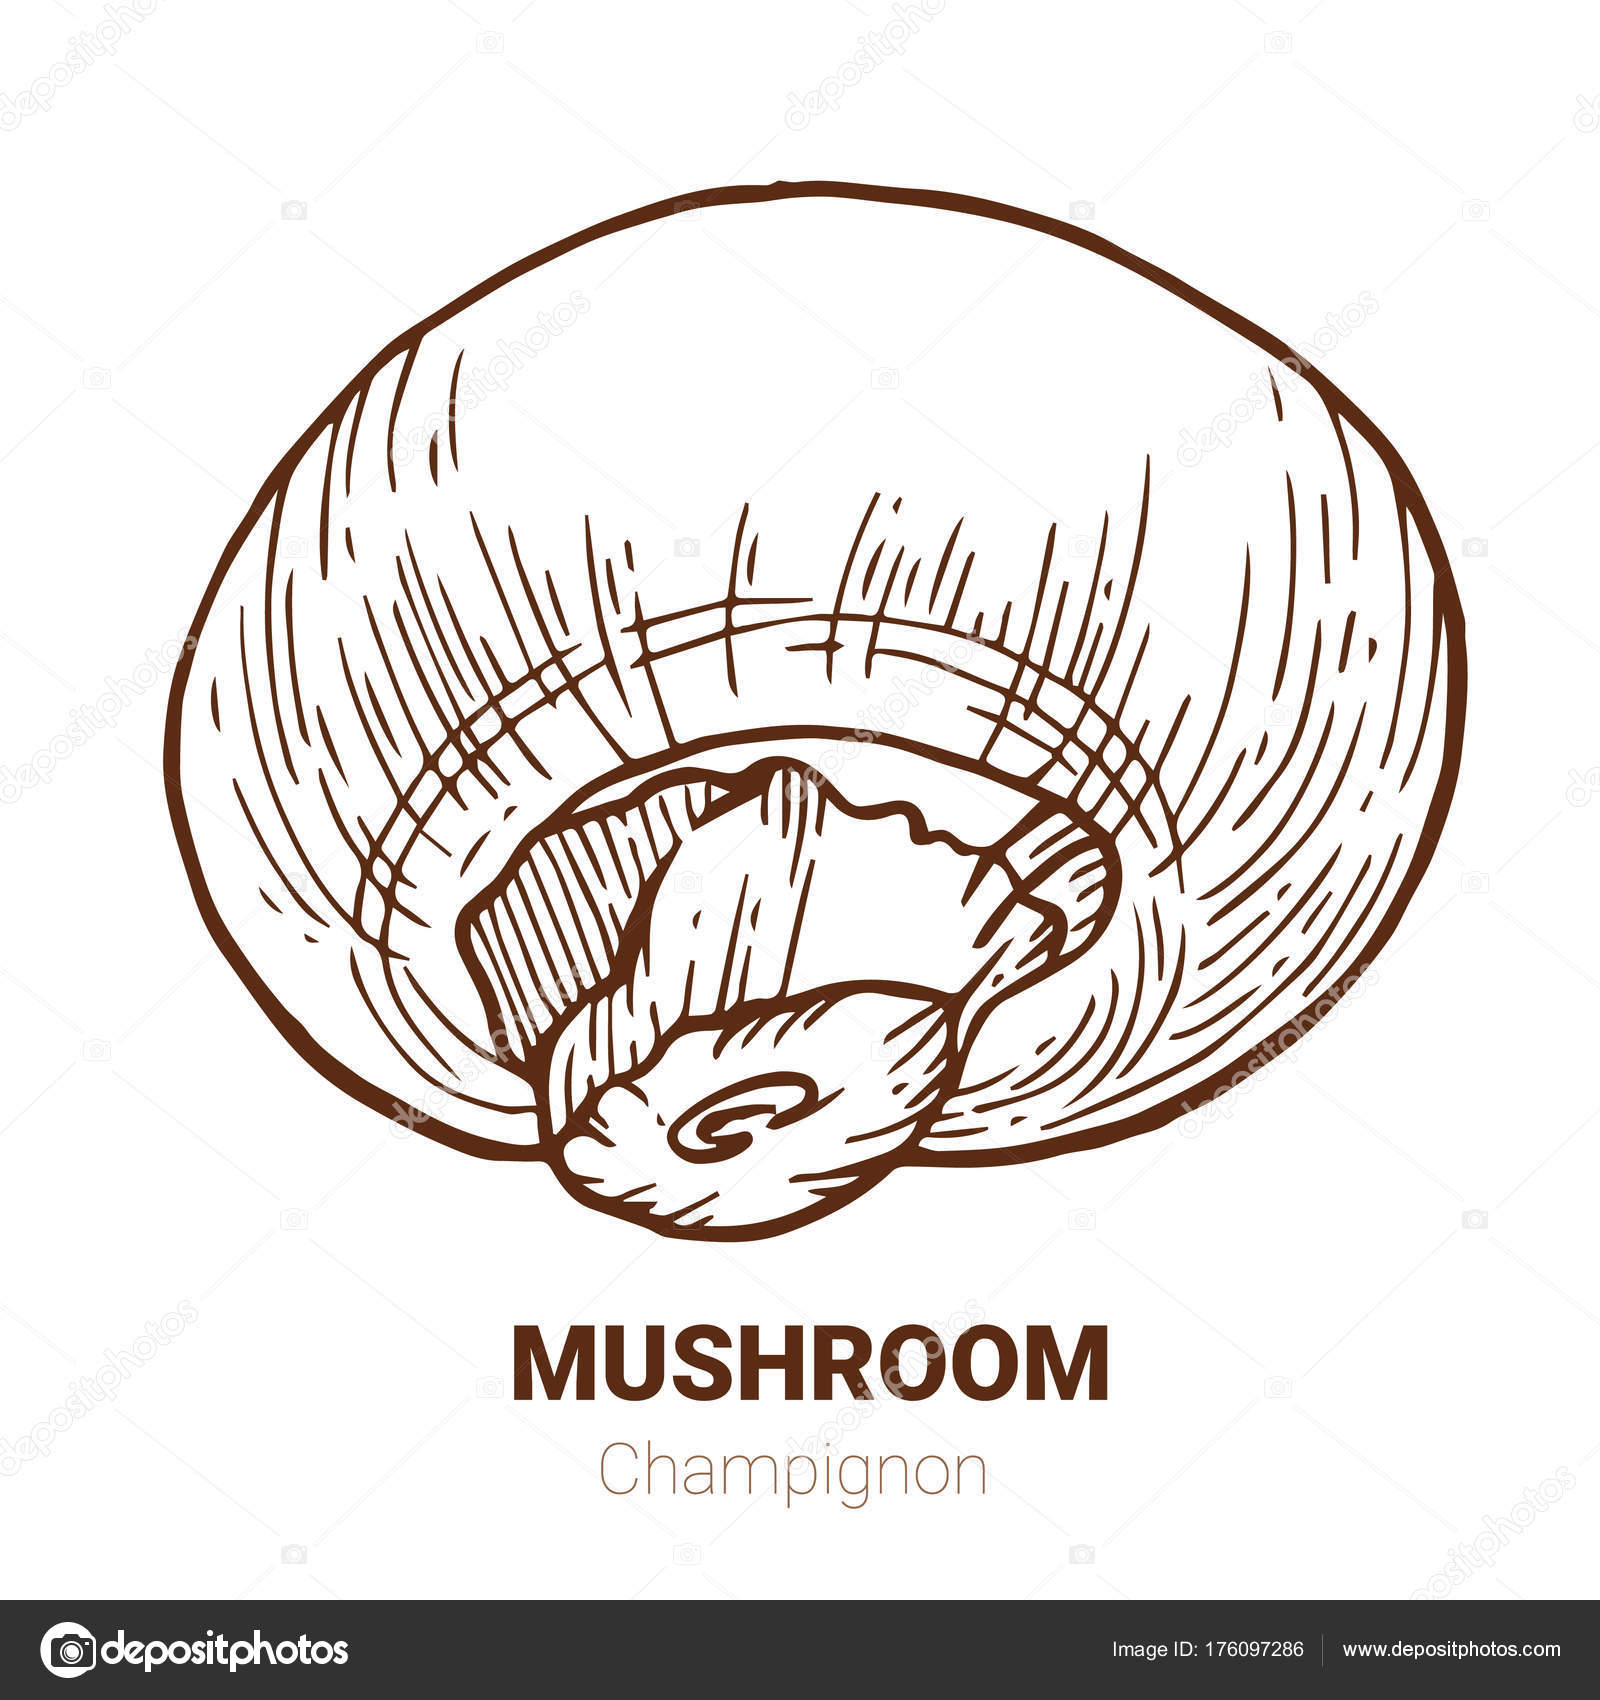 1600x1700 Champignon Hand Drawn Vector Illustration. Sketch Mushroom Draw